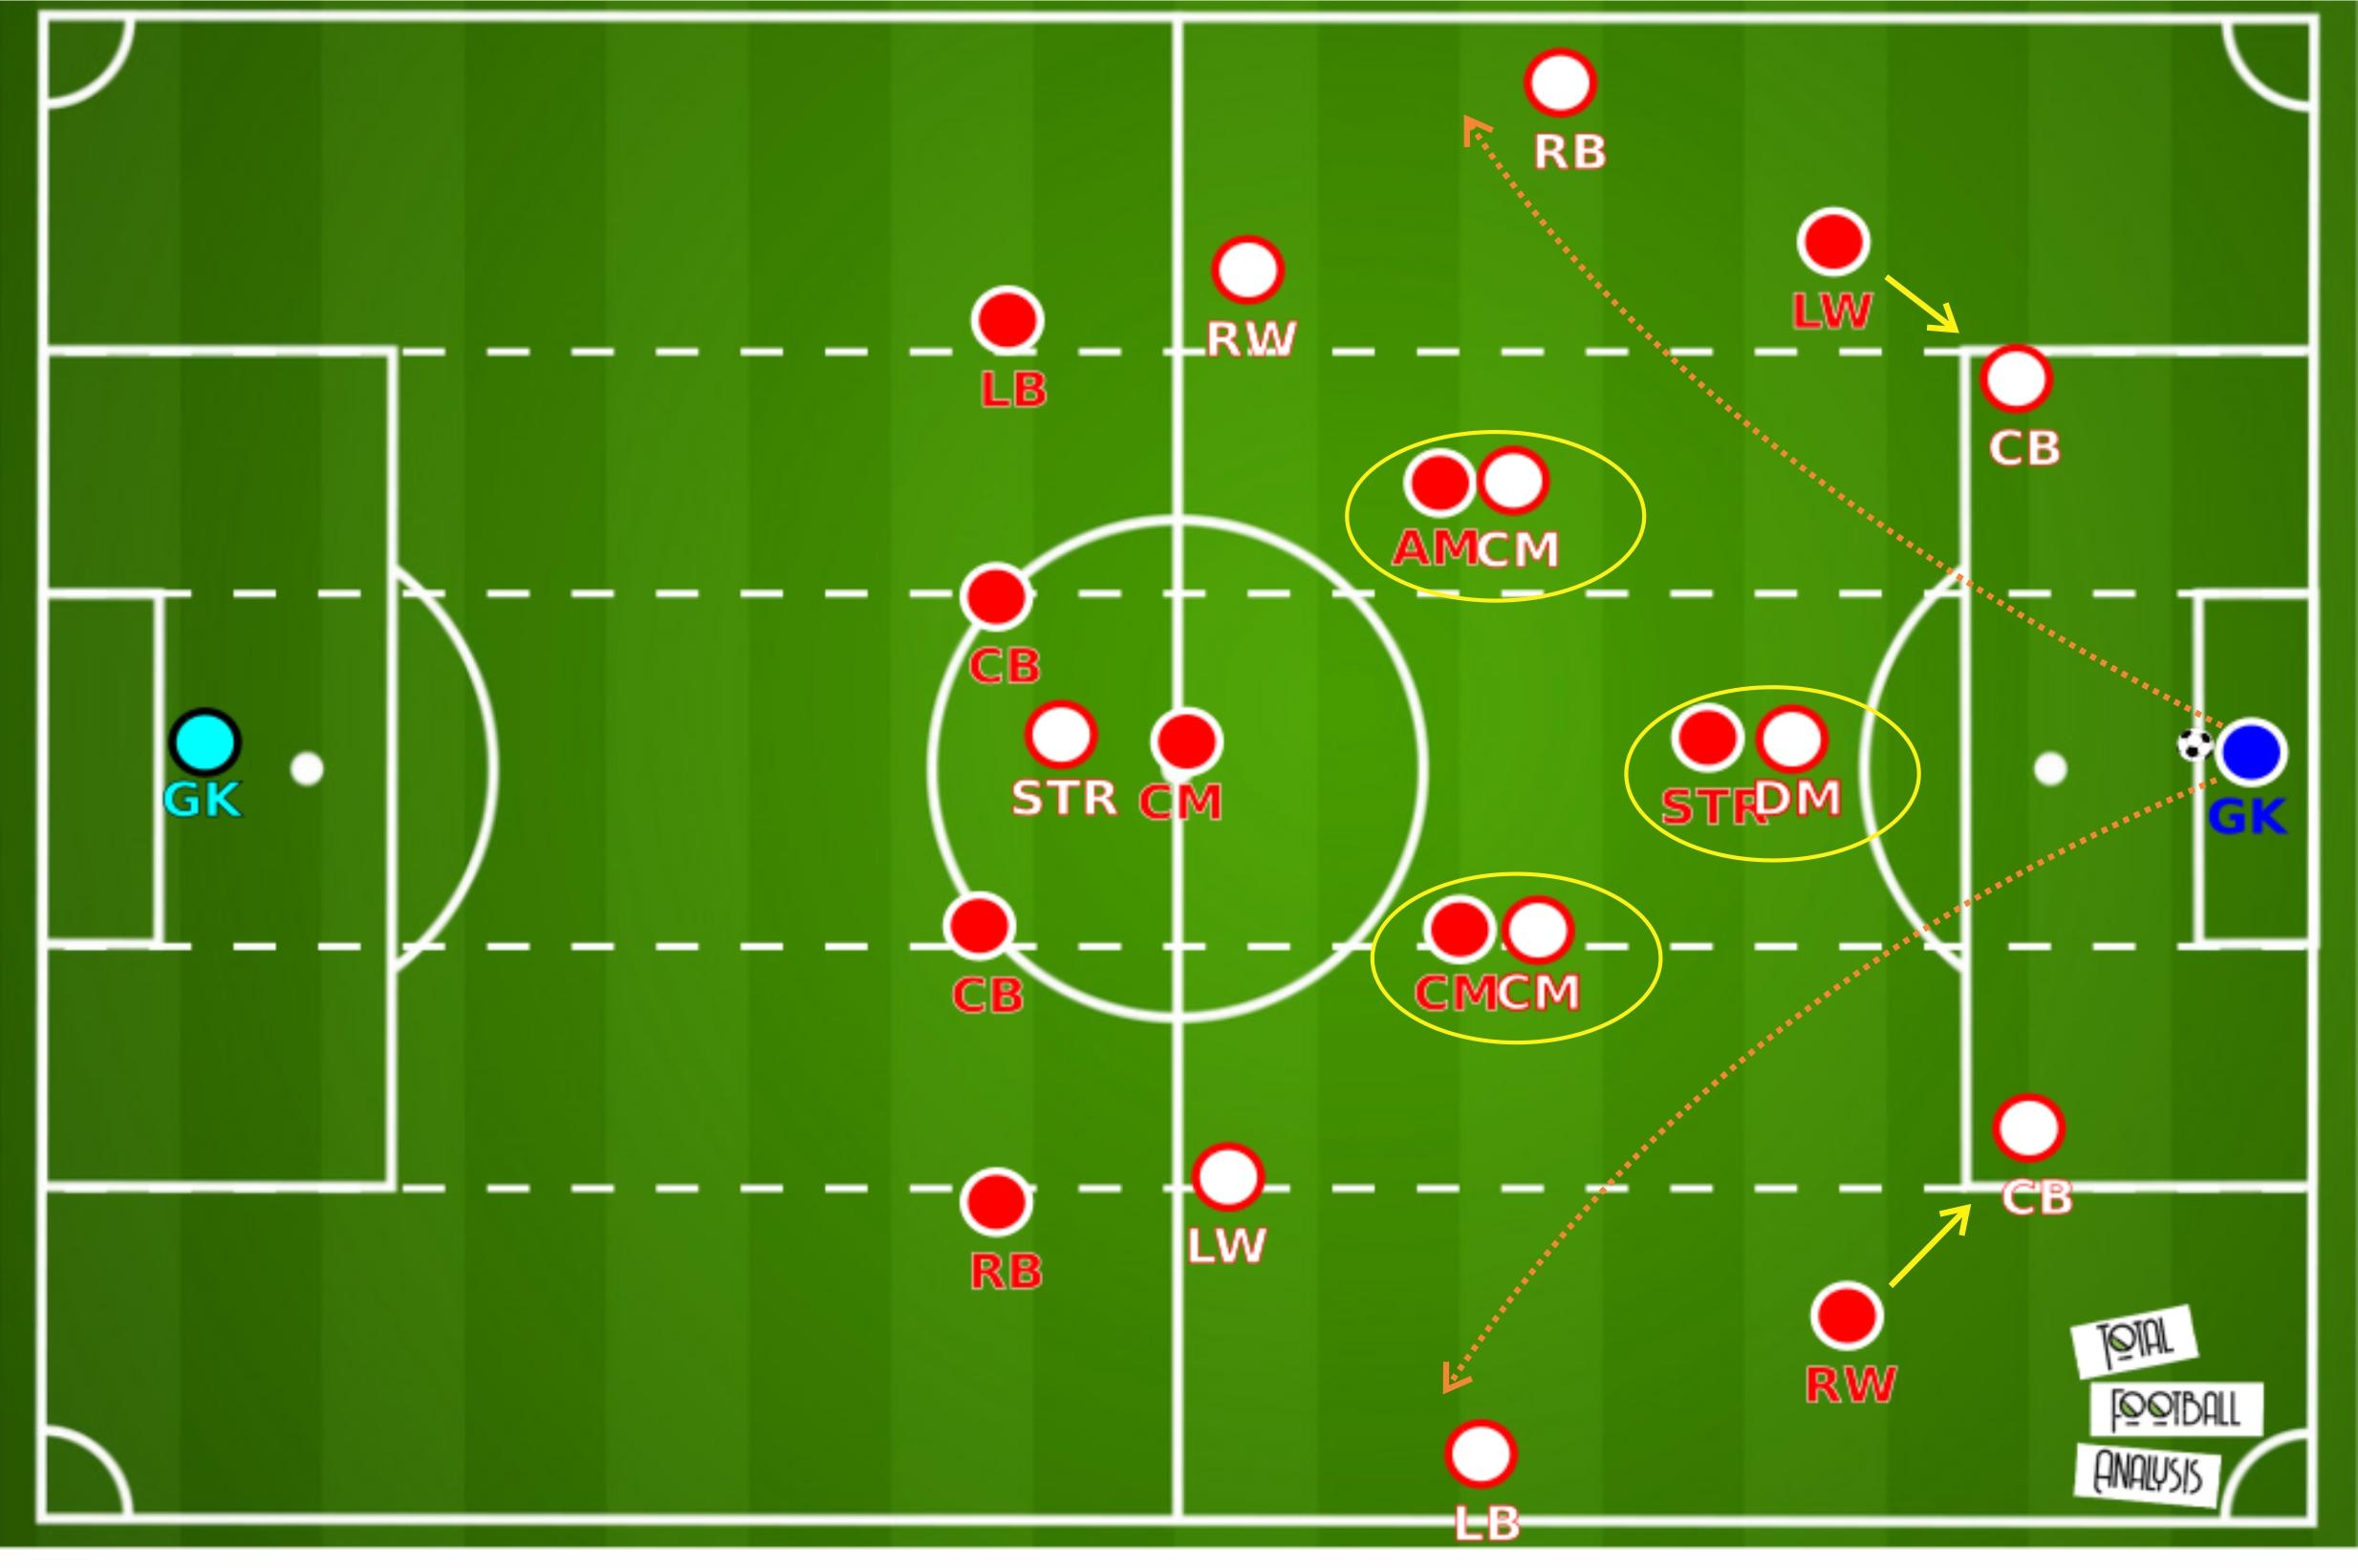 UEFA Super Cup 2020: Bayern Munich vs Sevilla - tactical analysis tactics